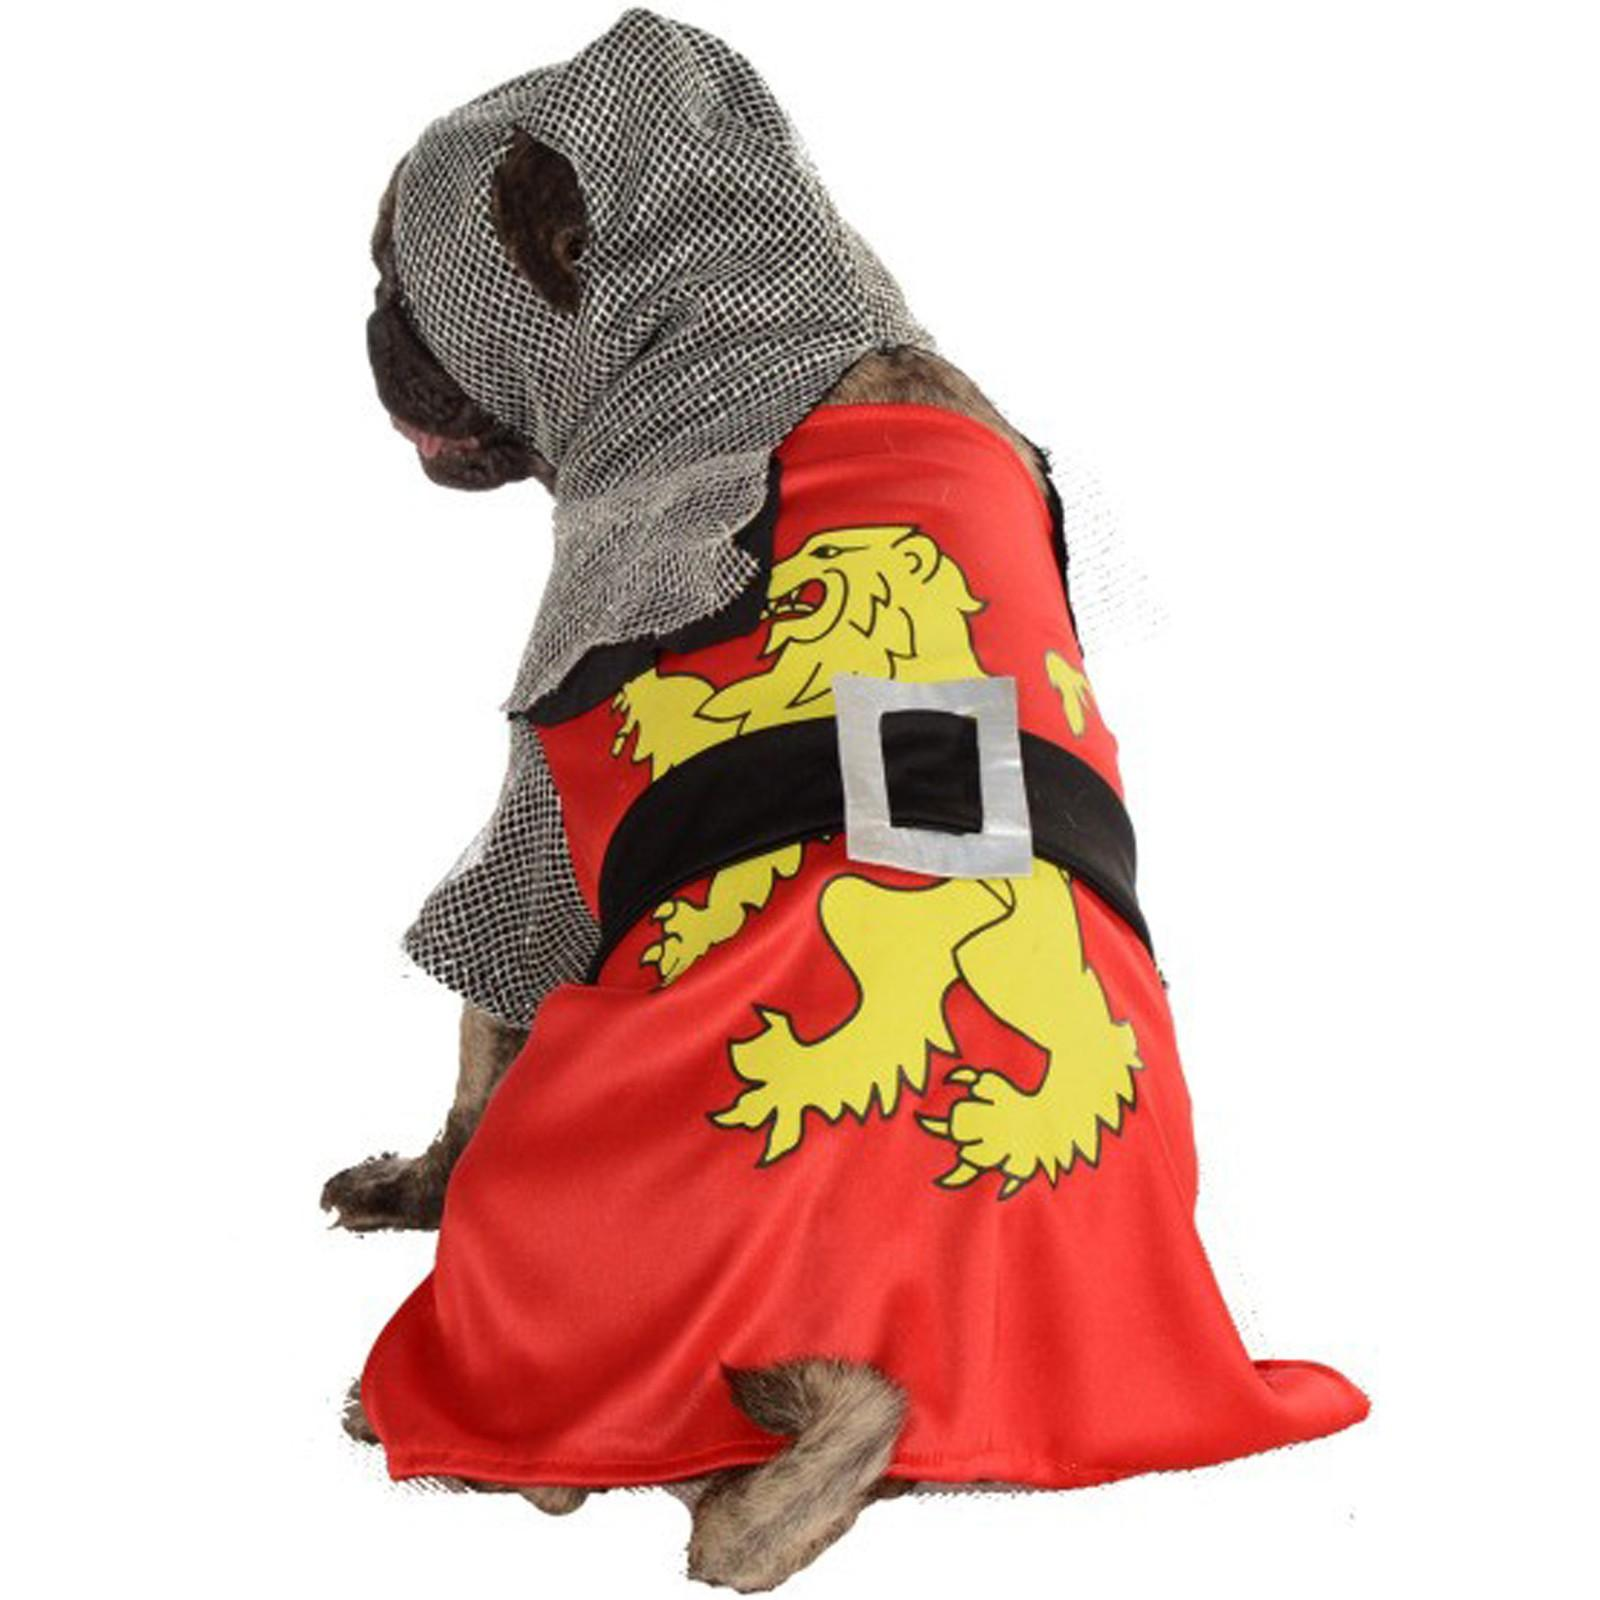 Sir Barks A Lot Knight Pet Costume M